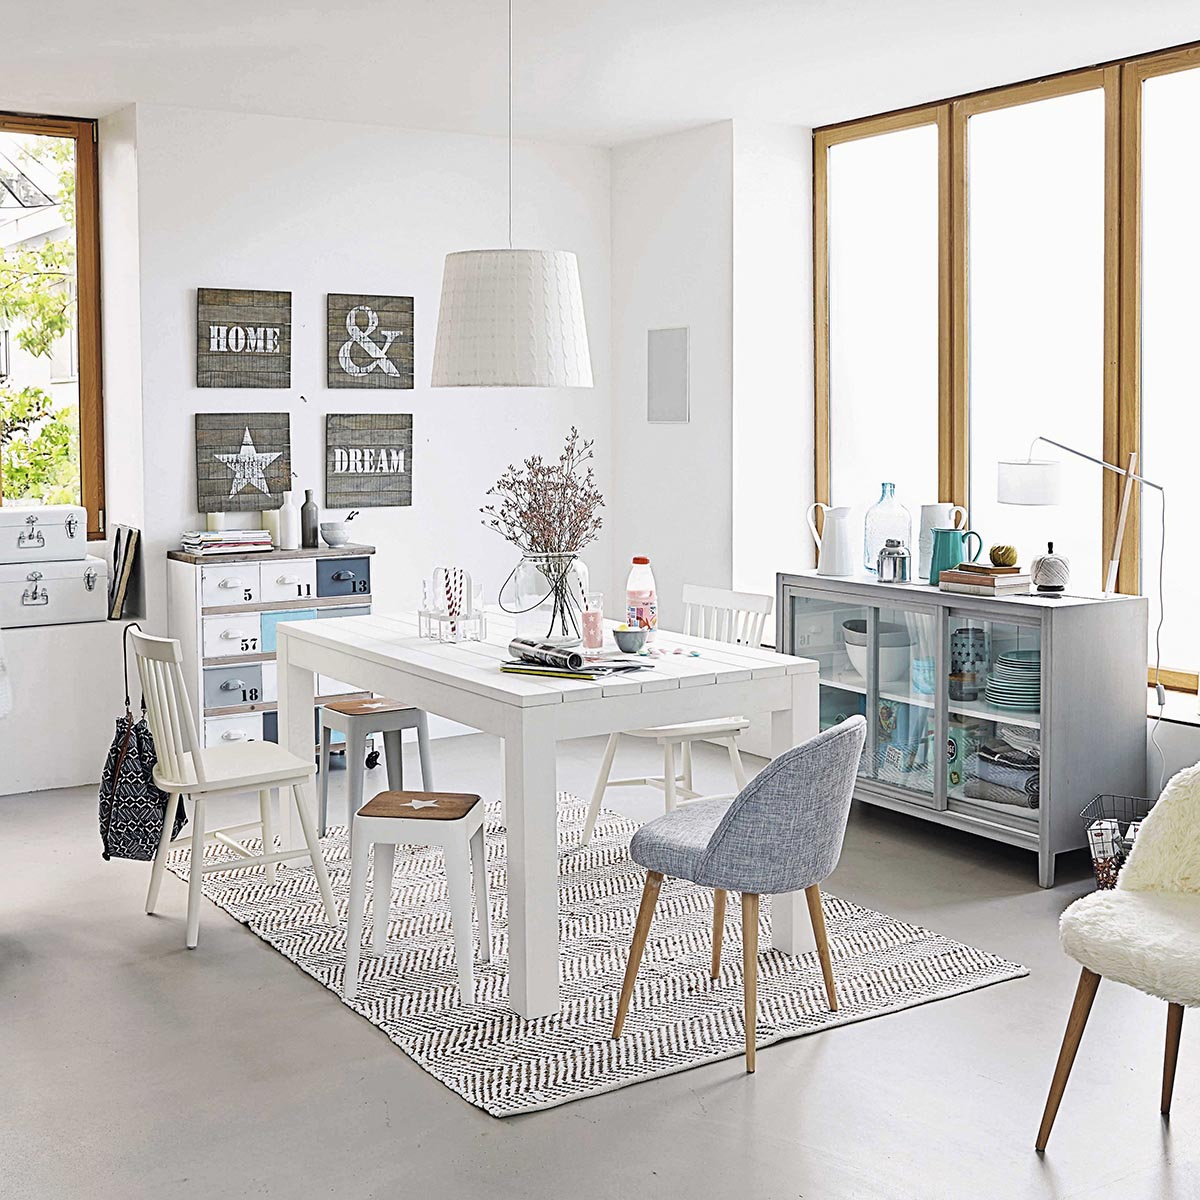 mesa con sillas blancas